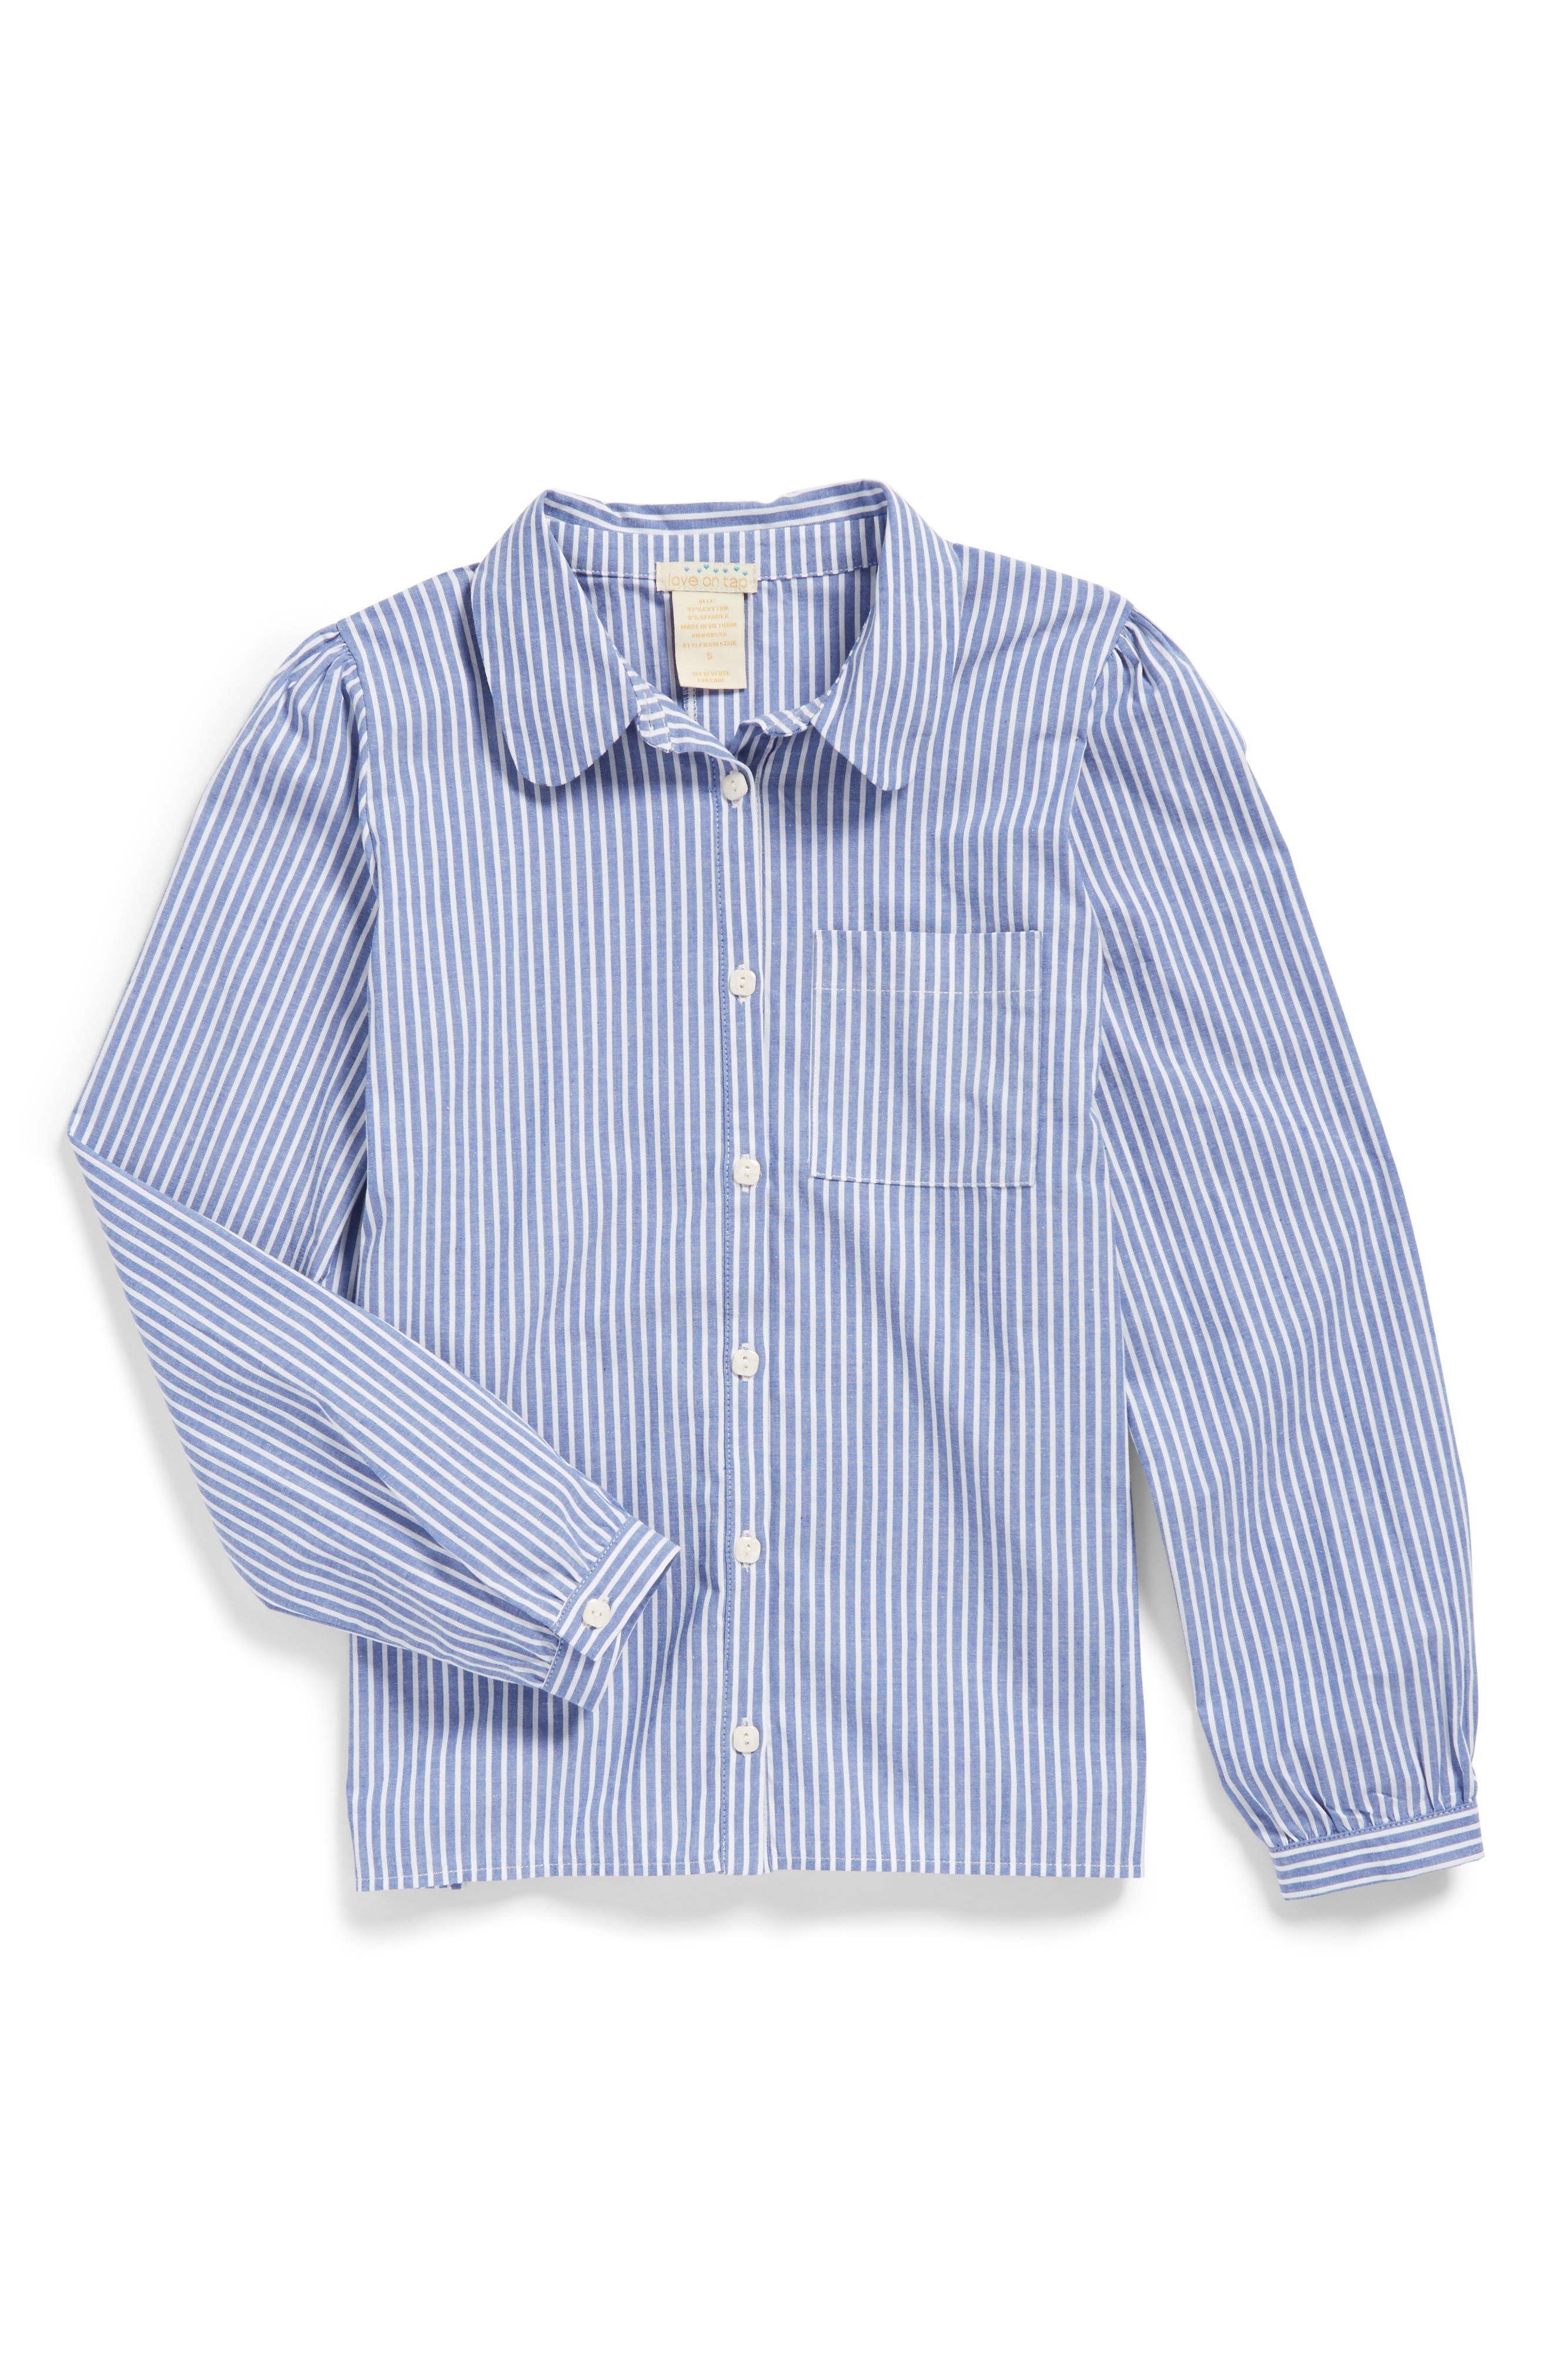 Stripe Stretch Cotton Shirt,                             Main thumbnail 1, color,                             430